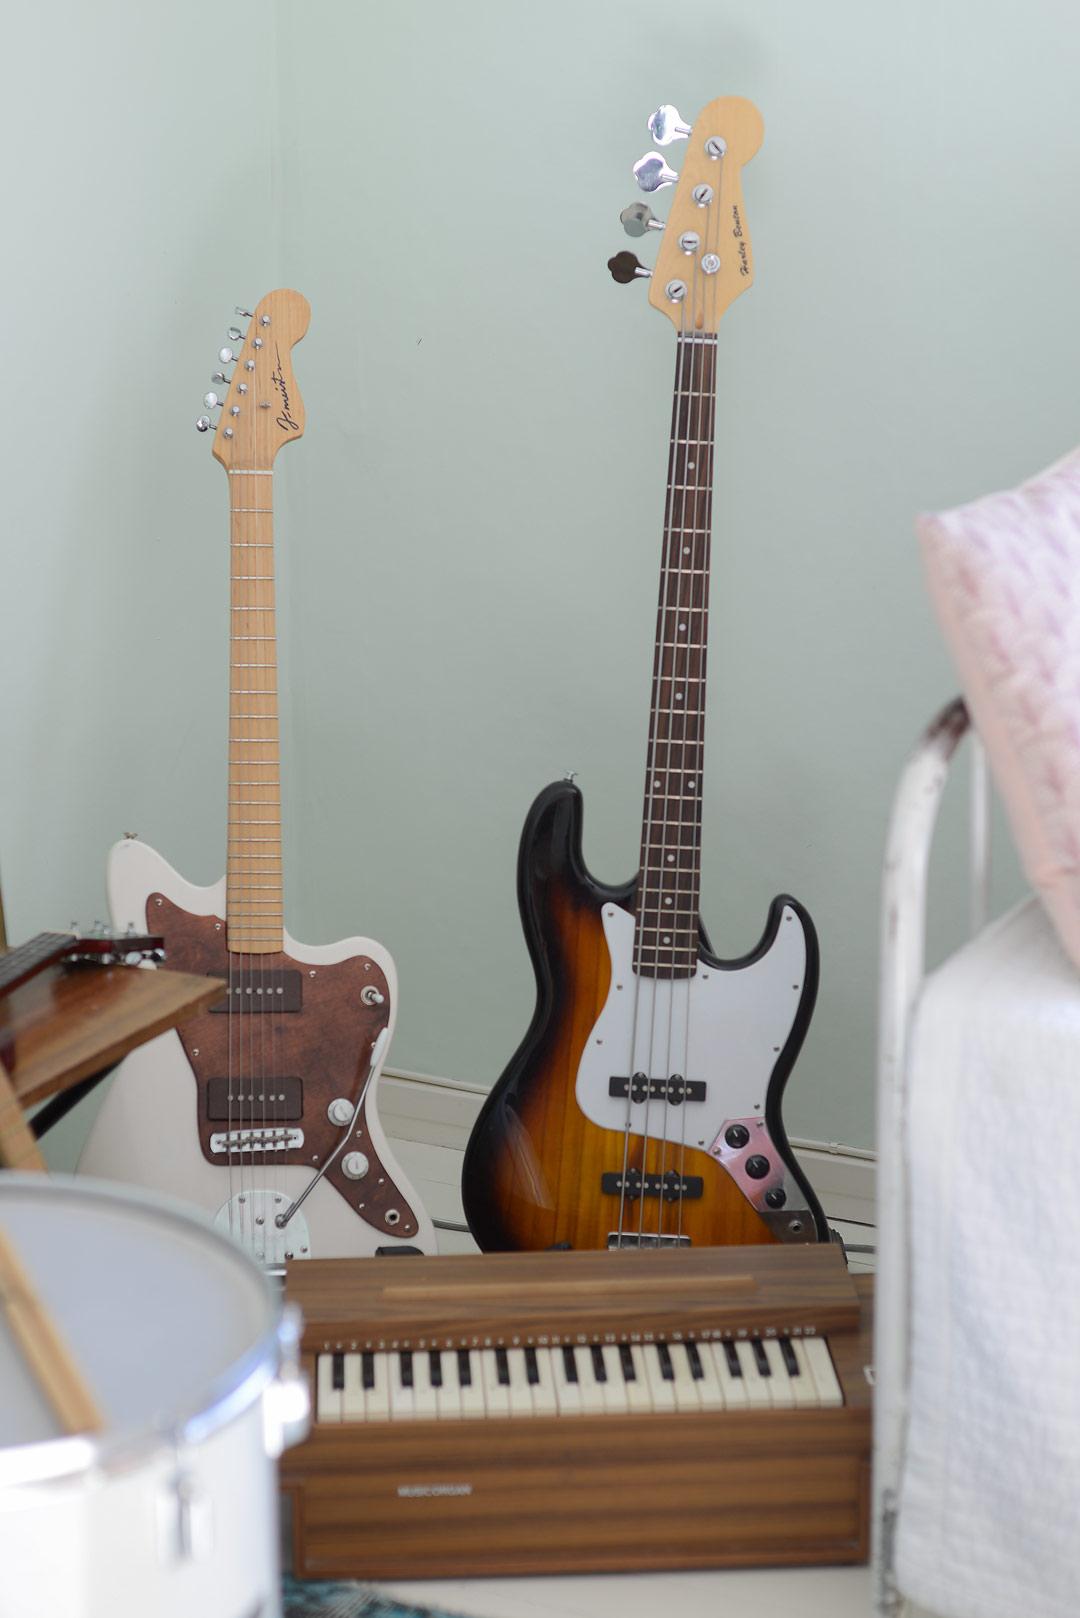 A DIY guitar and a second hand bass guitar